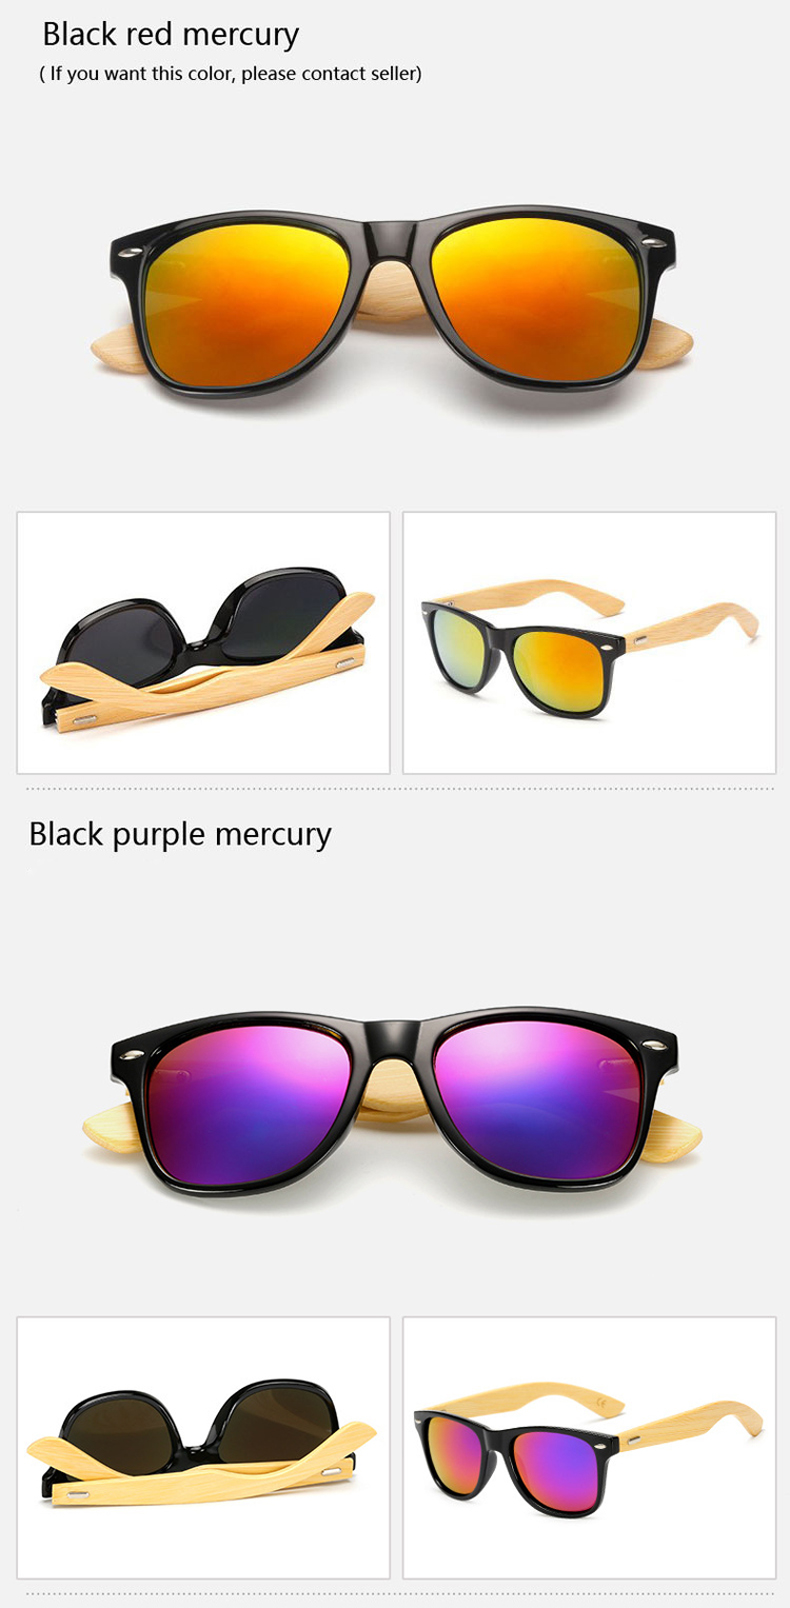 Ralferty Retro Wood Sunglasses Men Bamboo Sunglass Women Brand Design Sport Goggles Gold Mirror Sun Glasses Shades lunette oculo 11